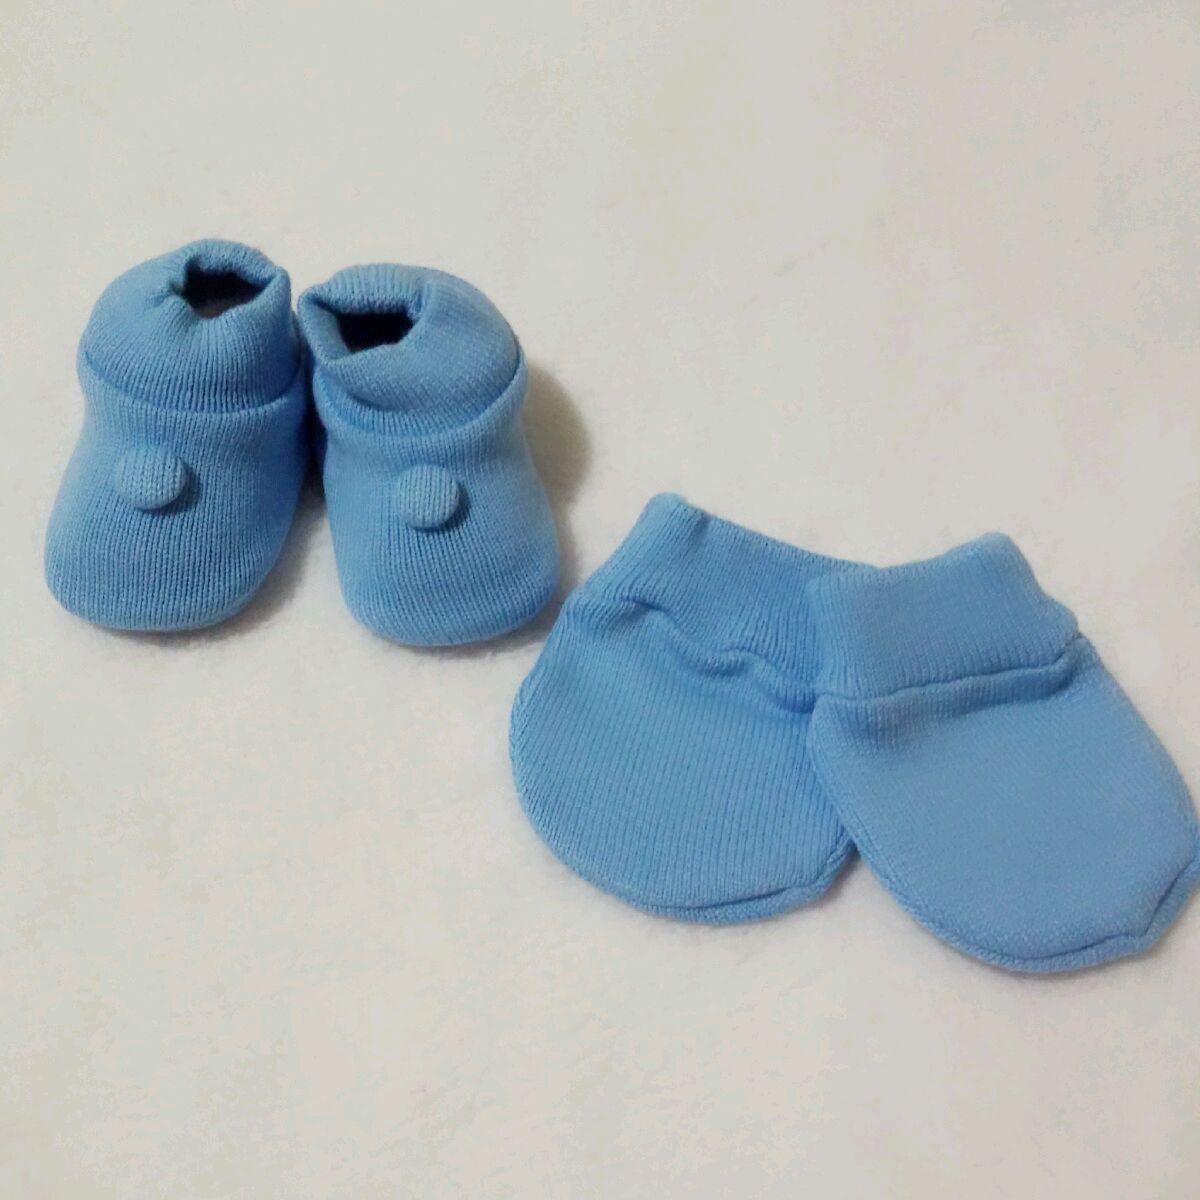 Kit Sapatinho e Luva Tricot - Azul no Elo7  1cdb761ea30